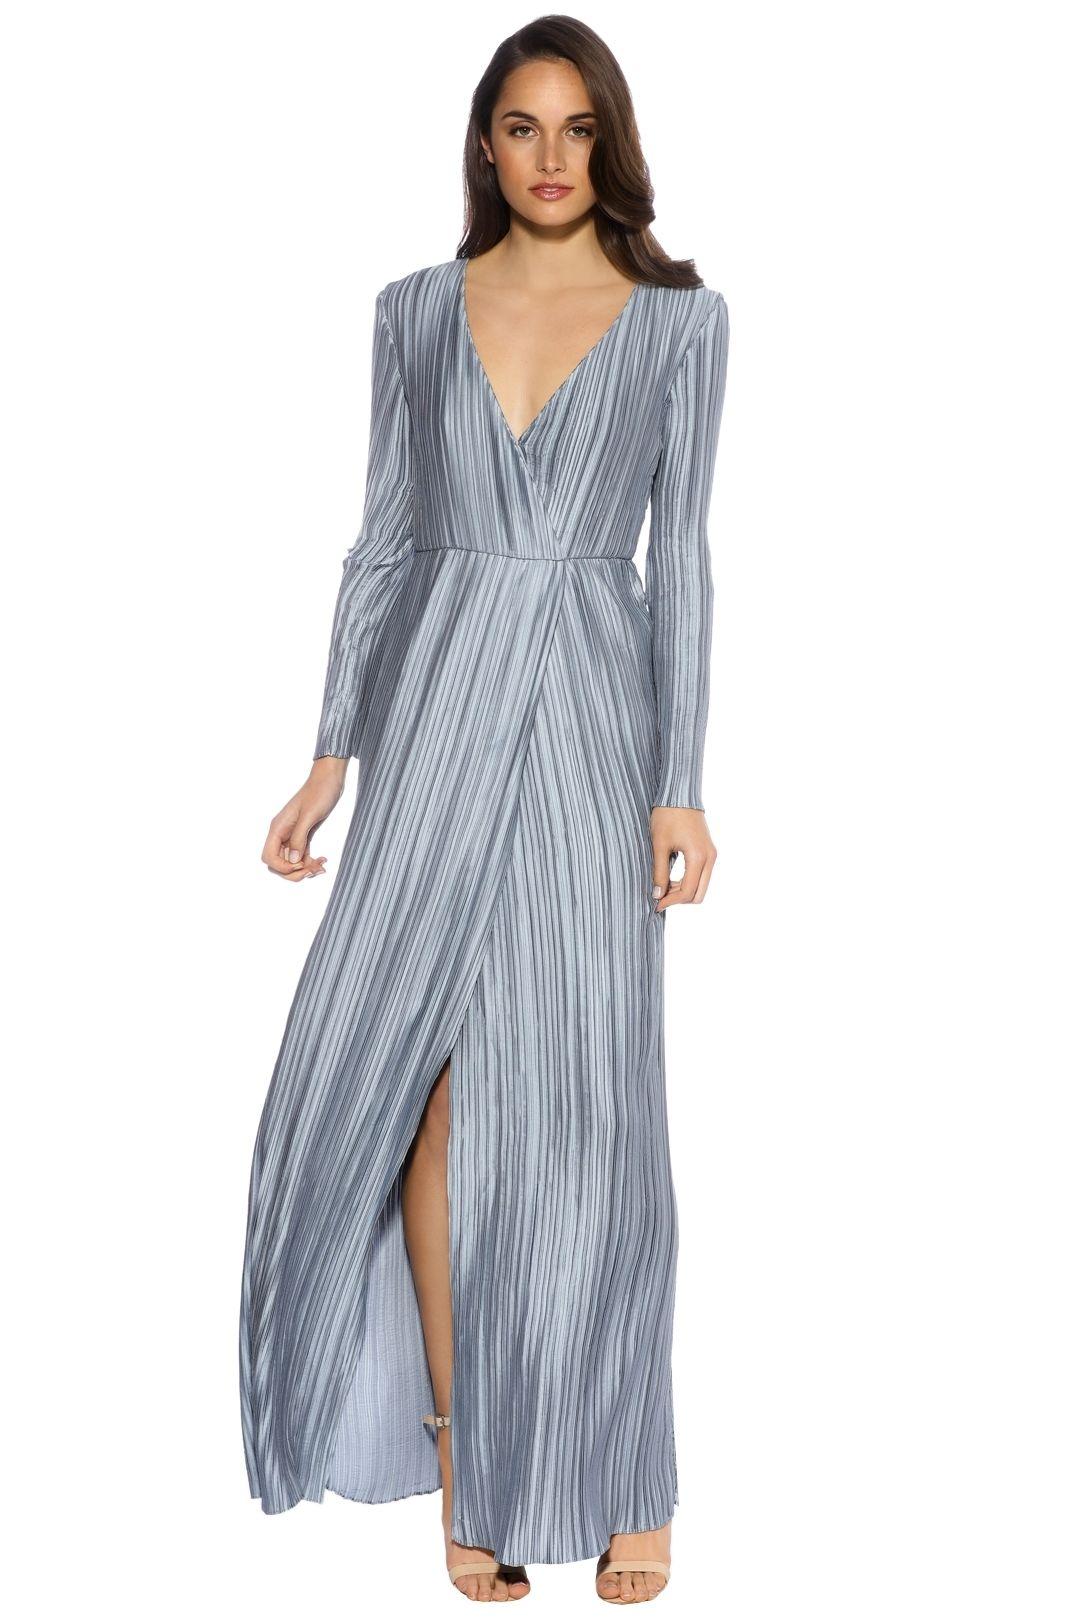 The Jetset Diaries - Primavera Maxi Dress - Powder Blue - Front